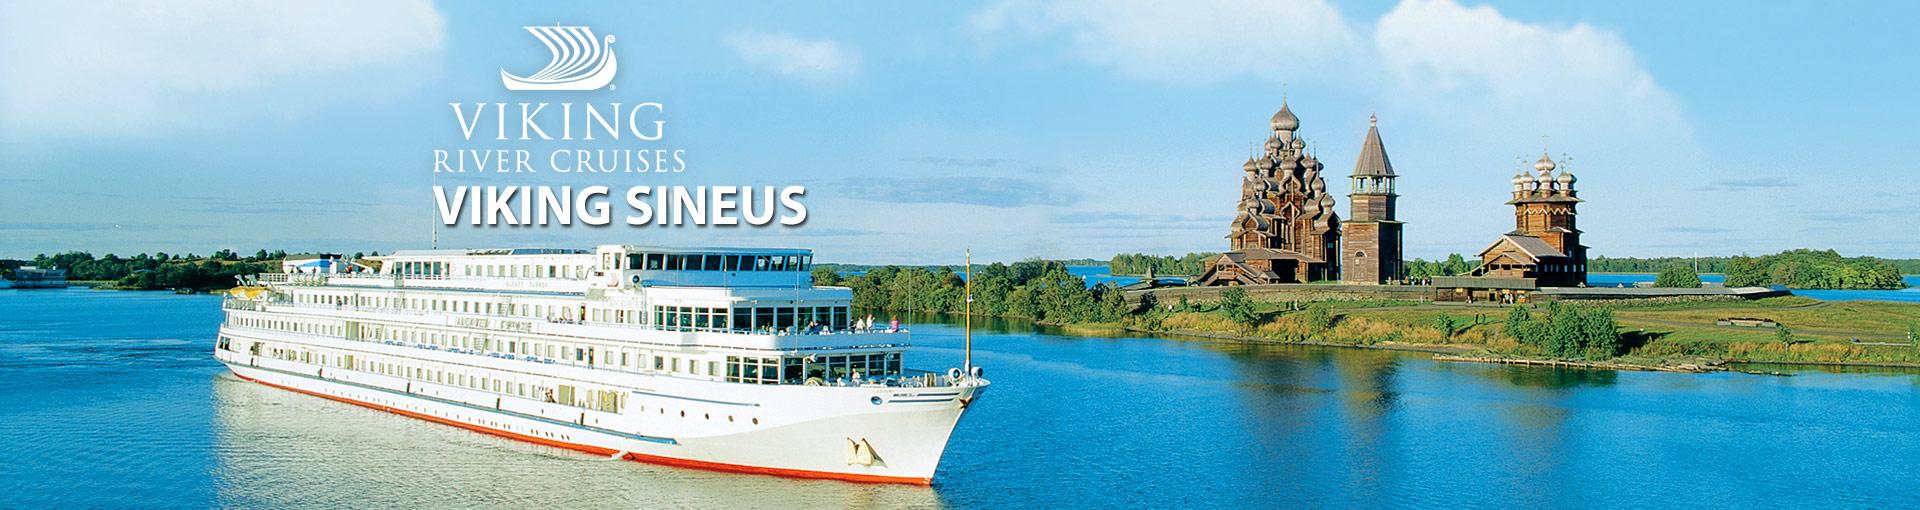 Viking Rivers Viking Sineus river cruise ship